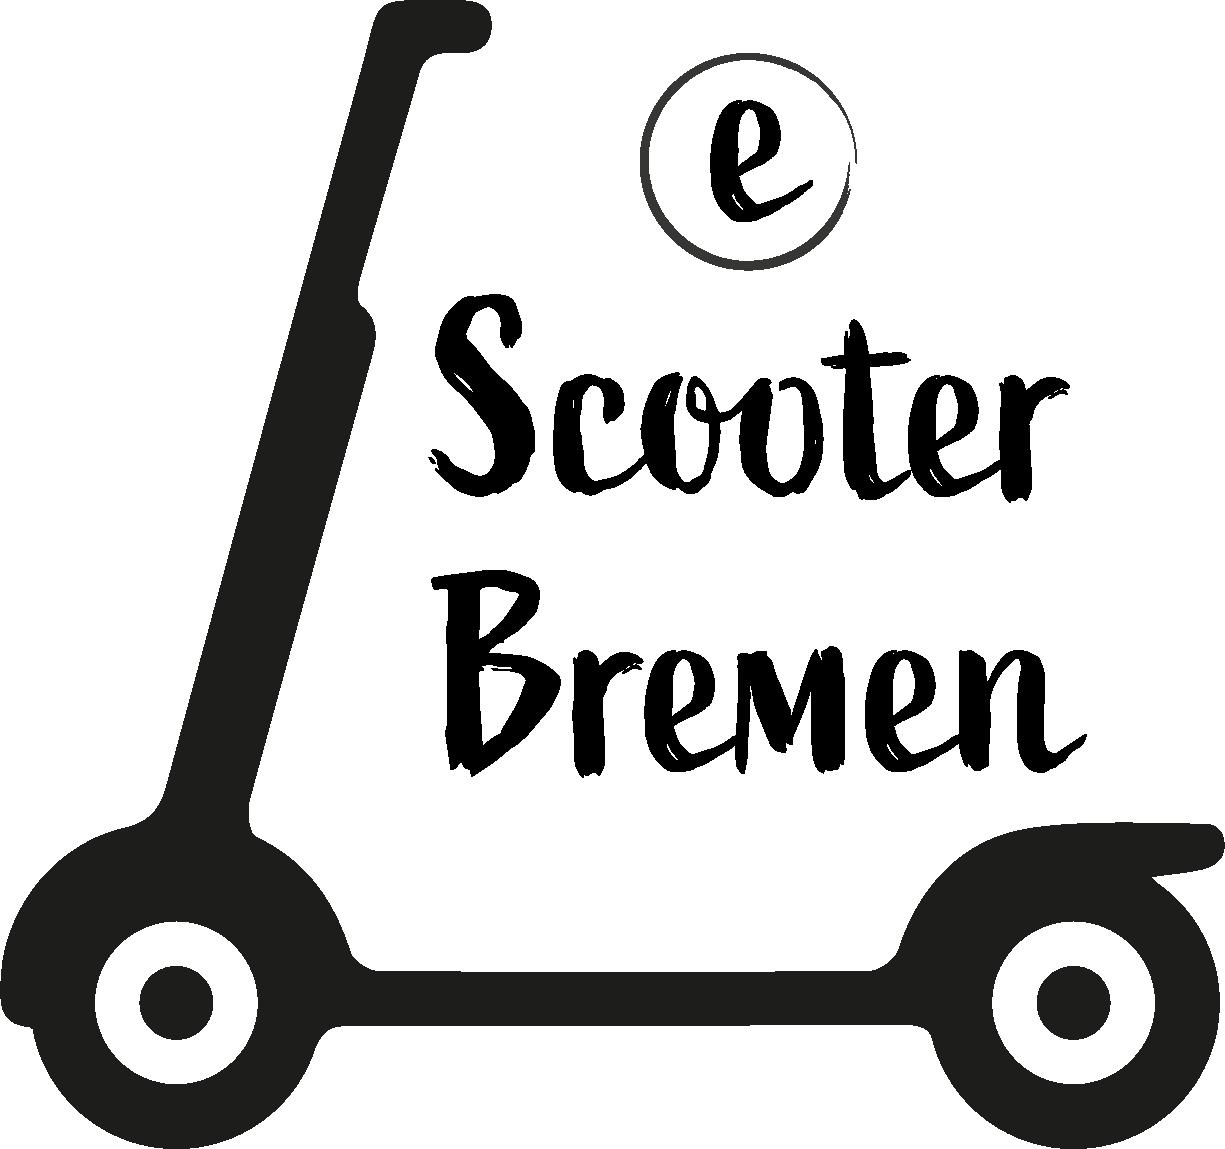 eScooter Bremen